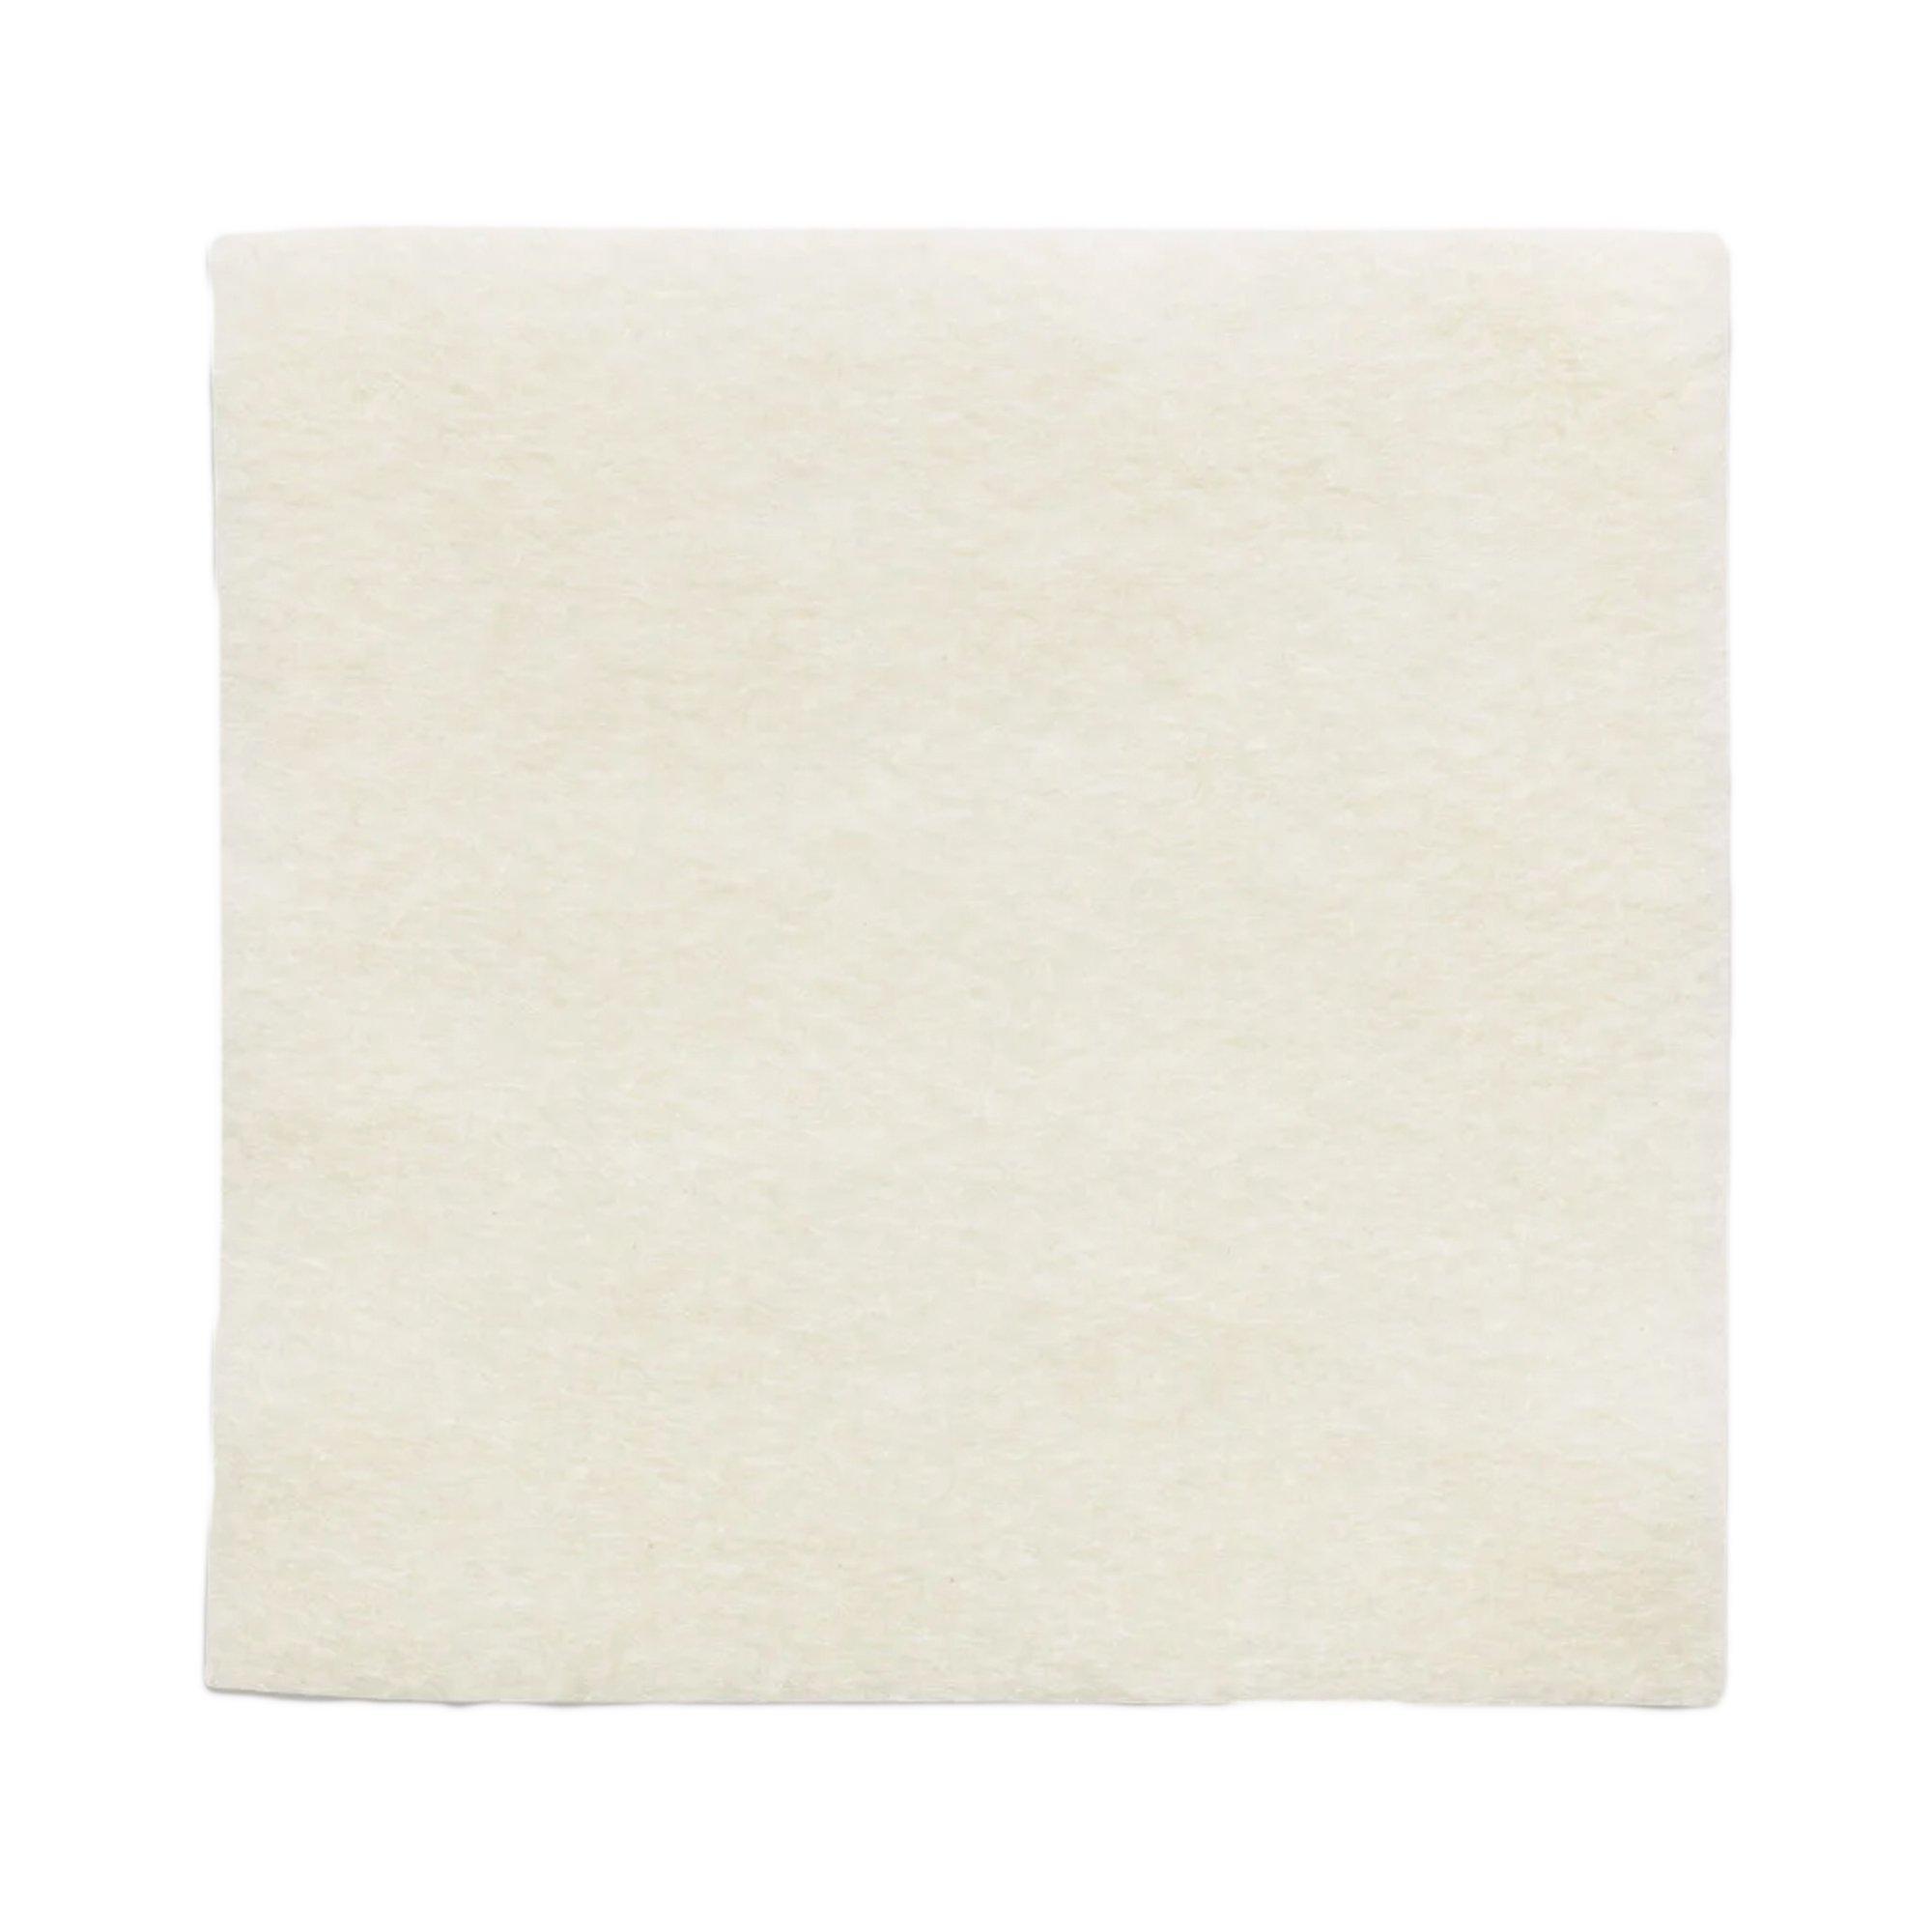 "Molnlycke Melgisorb Plus Calcium Alginate Dressing, 4 X 4"", 252200, Box of 10"